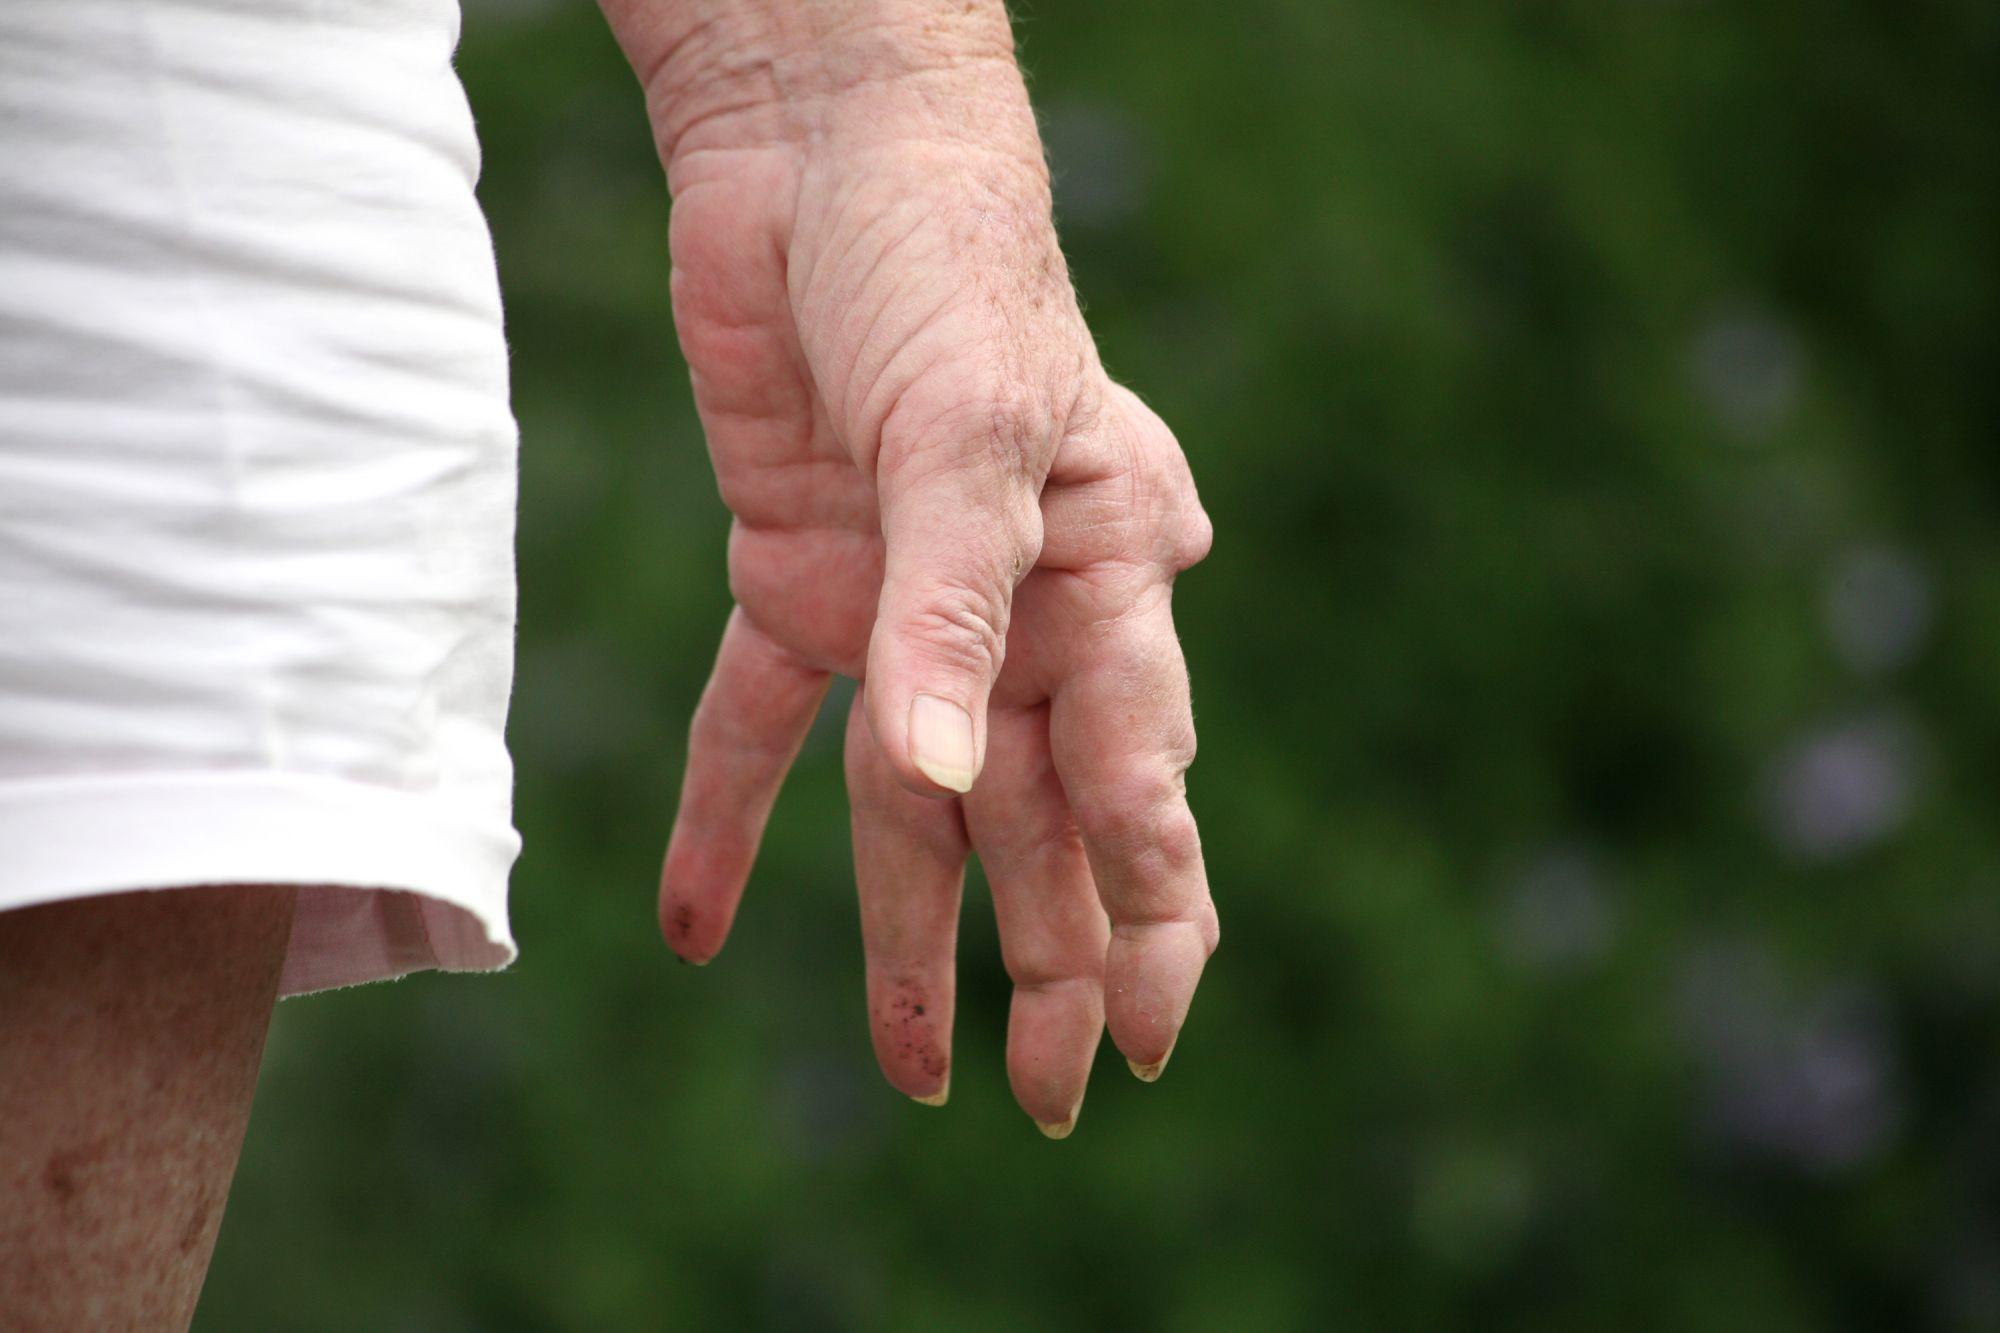 Reumatické ochorenia ruky